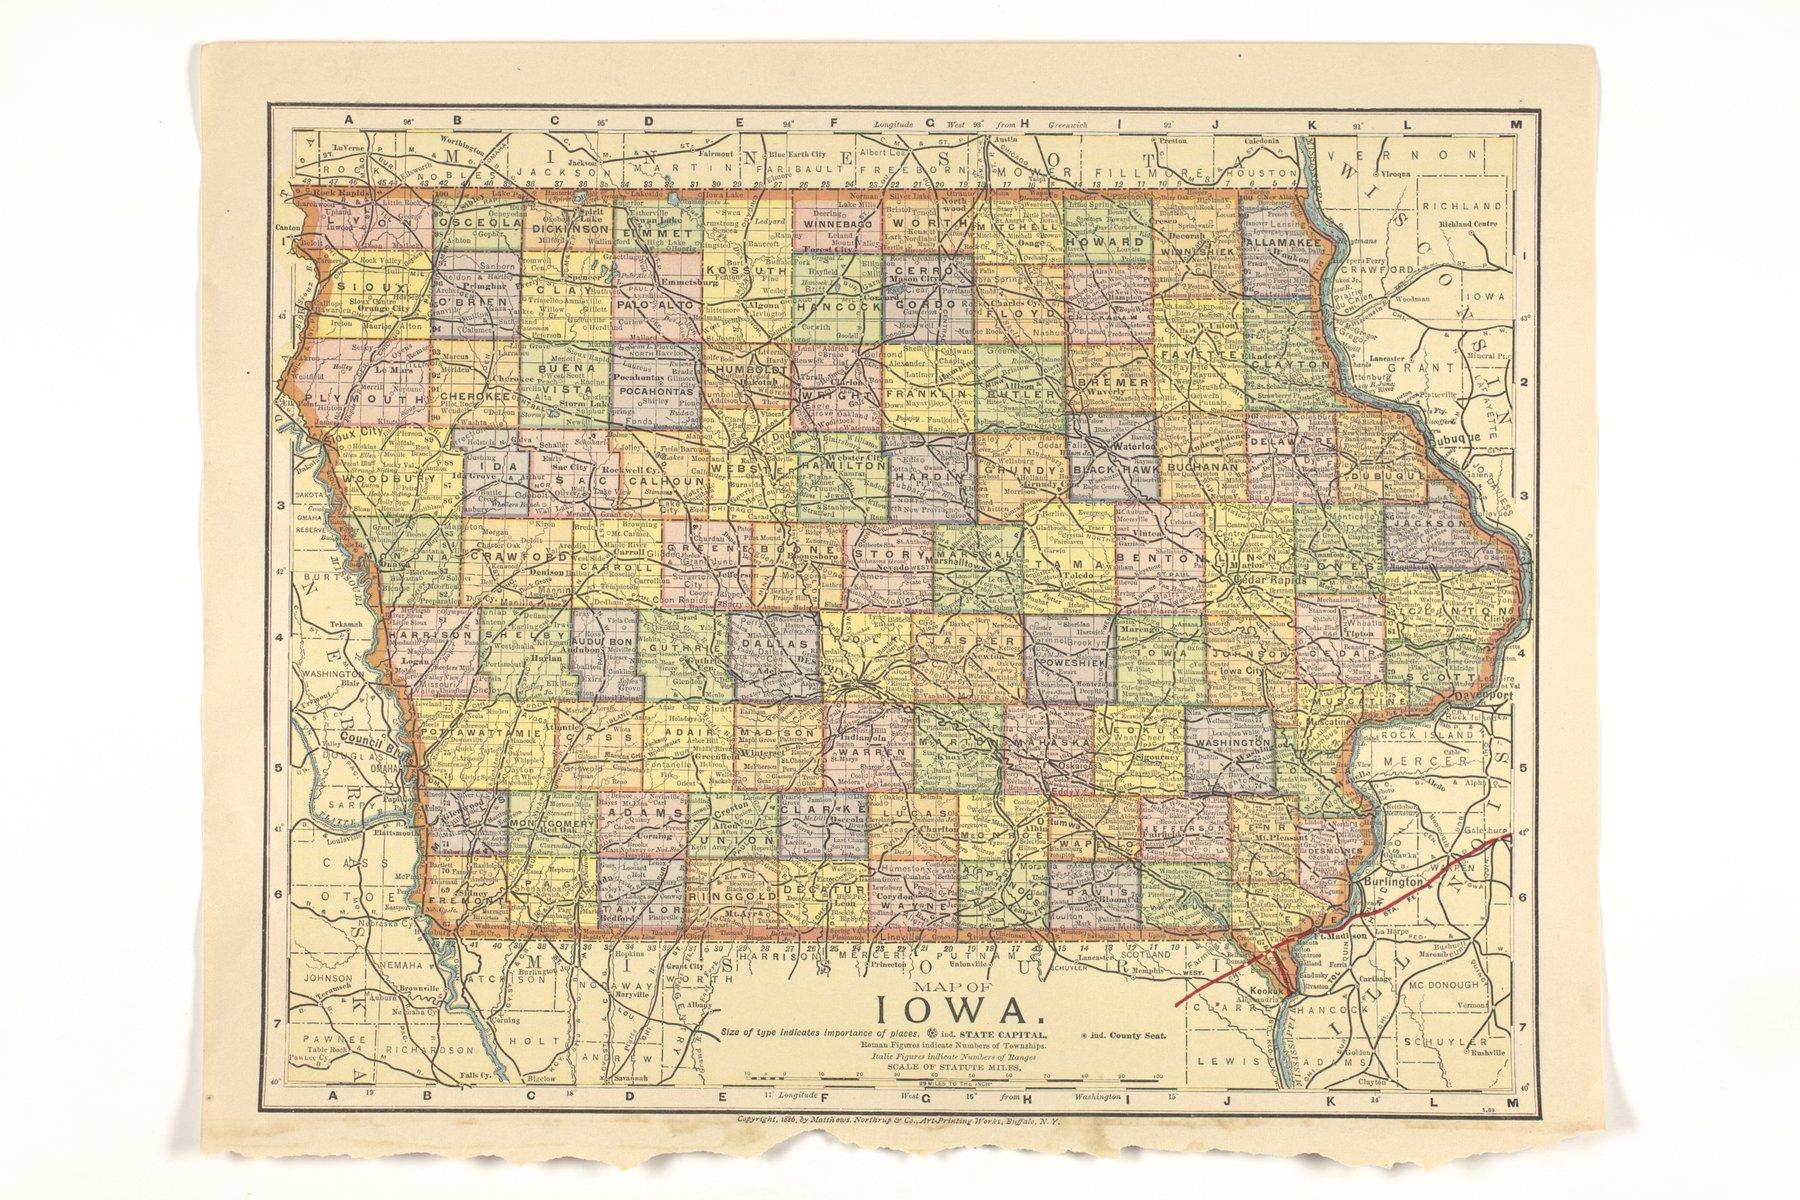 Atlas of the Santa Fe Route - Map of Iowa